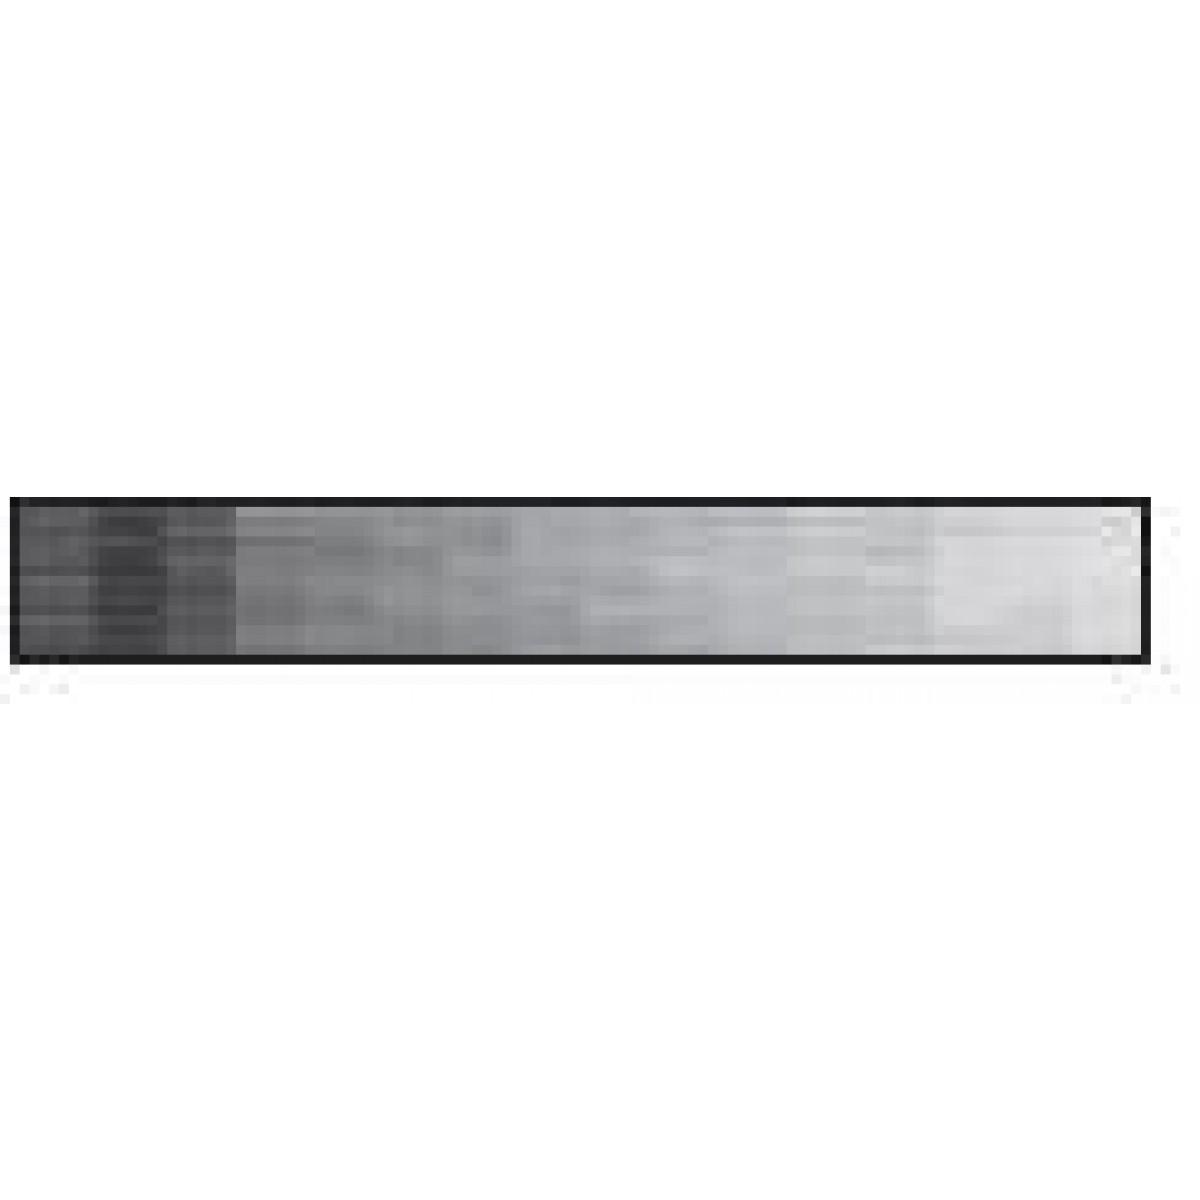 8512 Kunstnerkvalitet soft pastel Ivory black